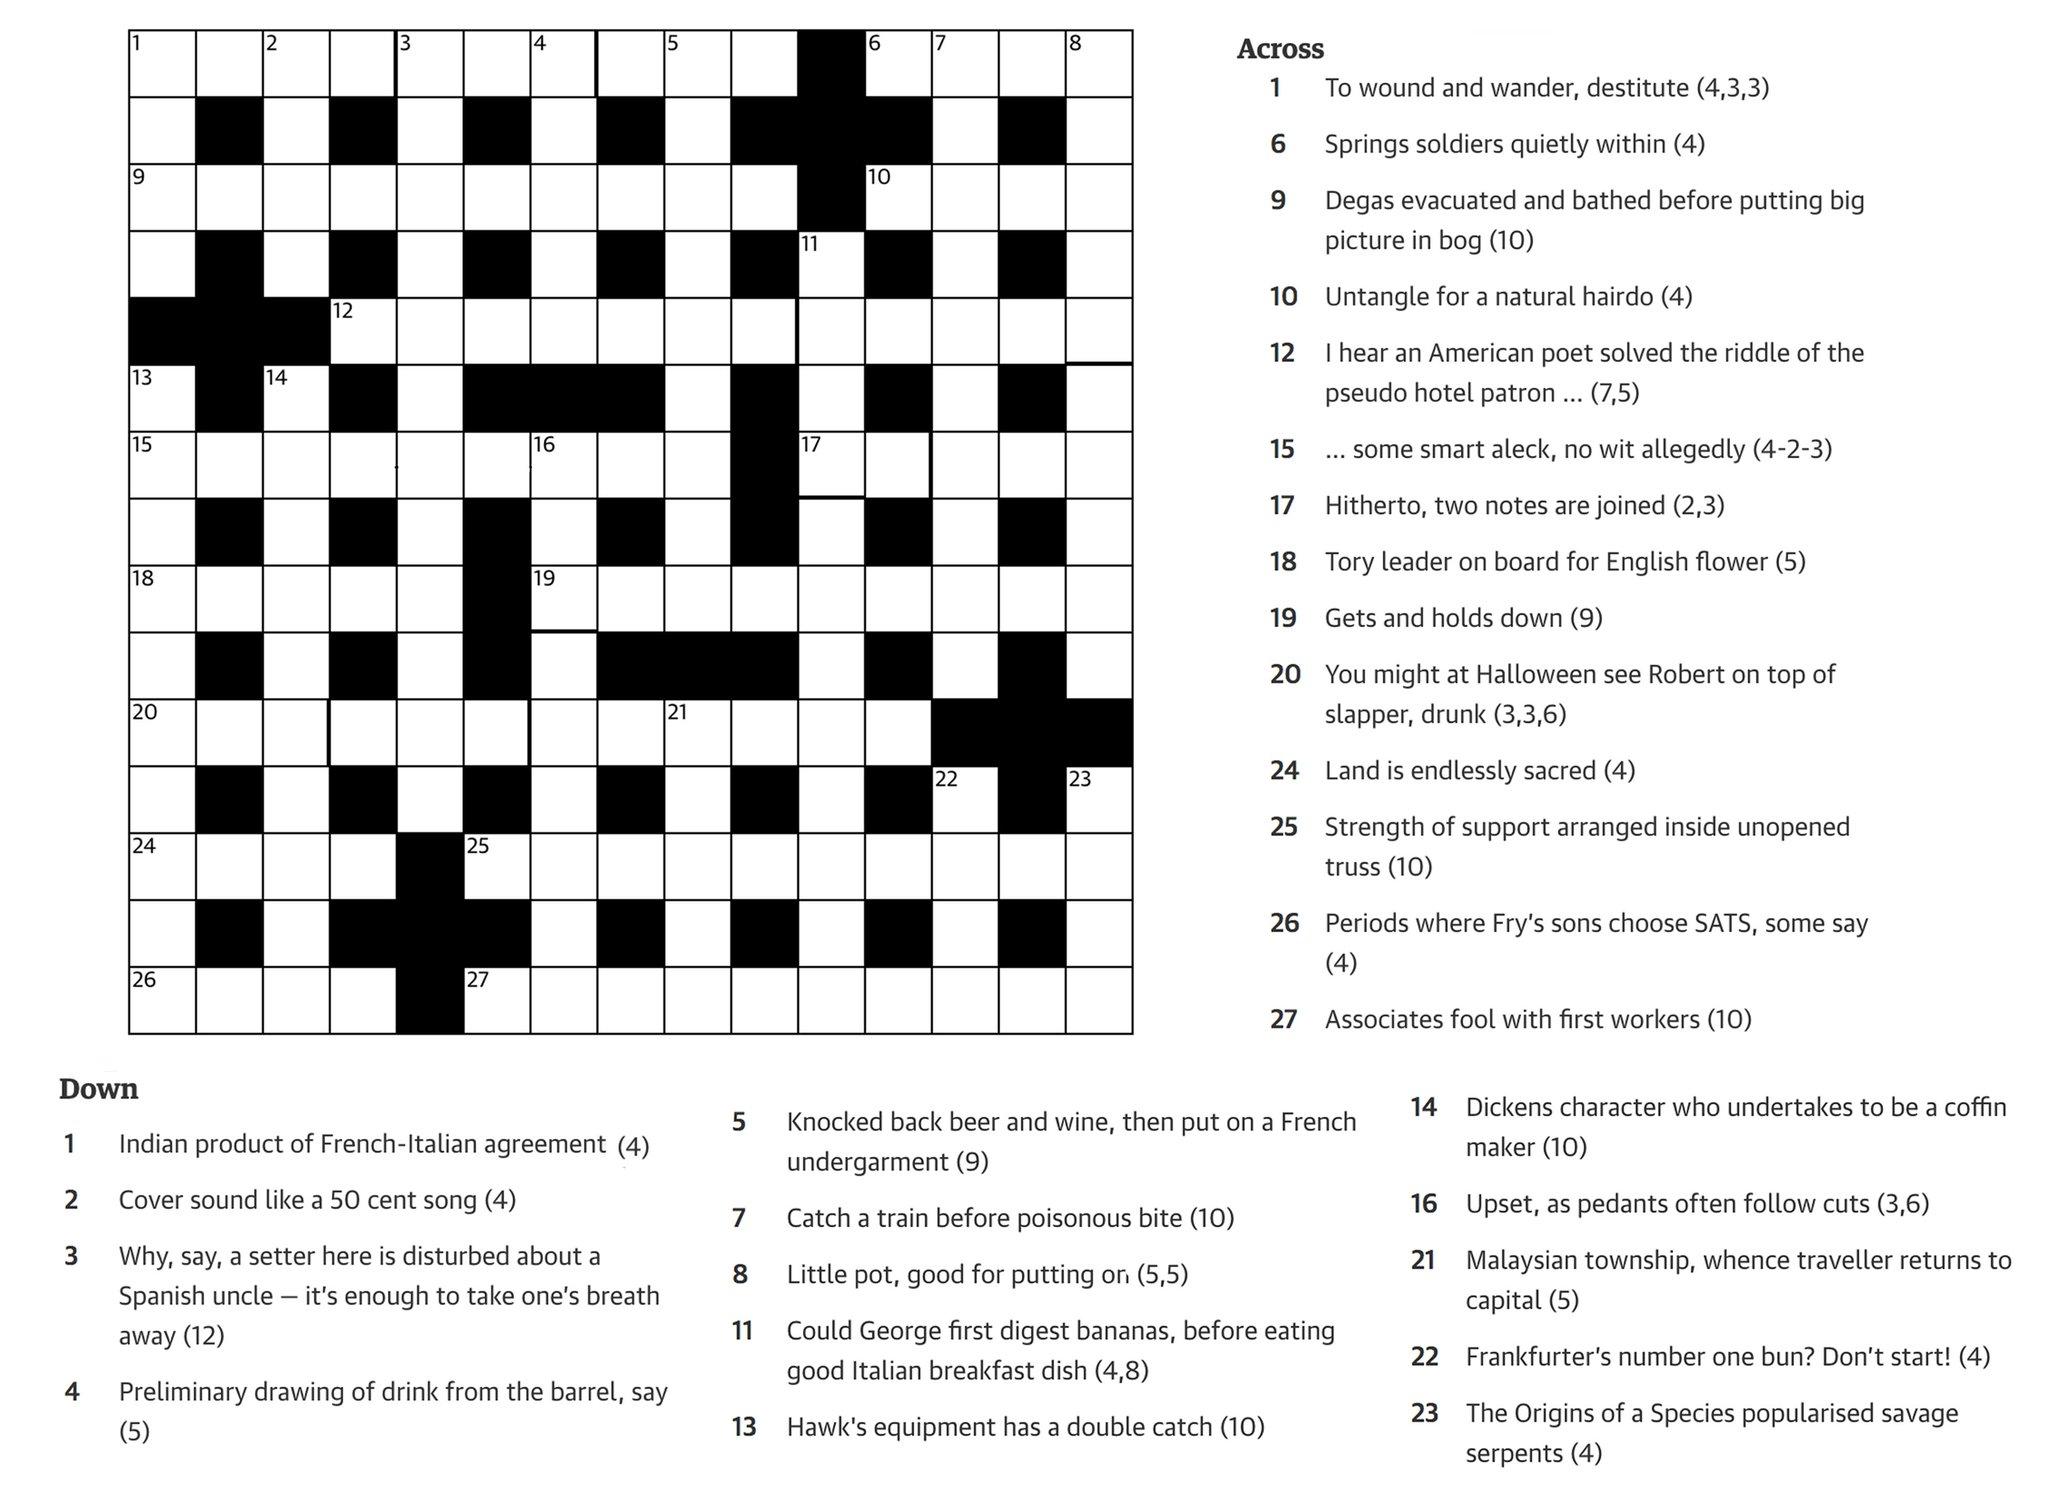 RT @SundayBrunchC4: Want to give @SP1nightonly's crossword a go? #SundayBrunch https://t.co/AenzPZNINh